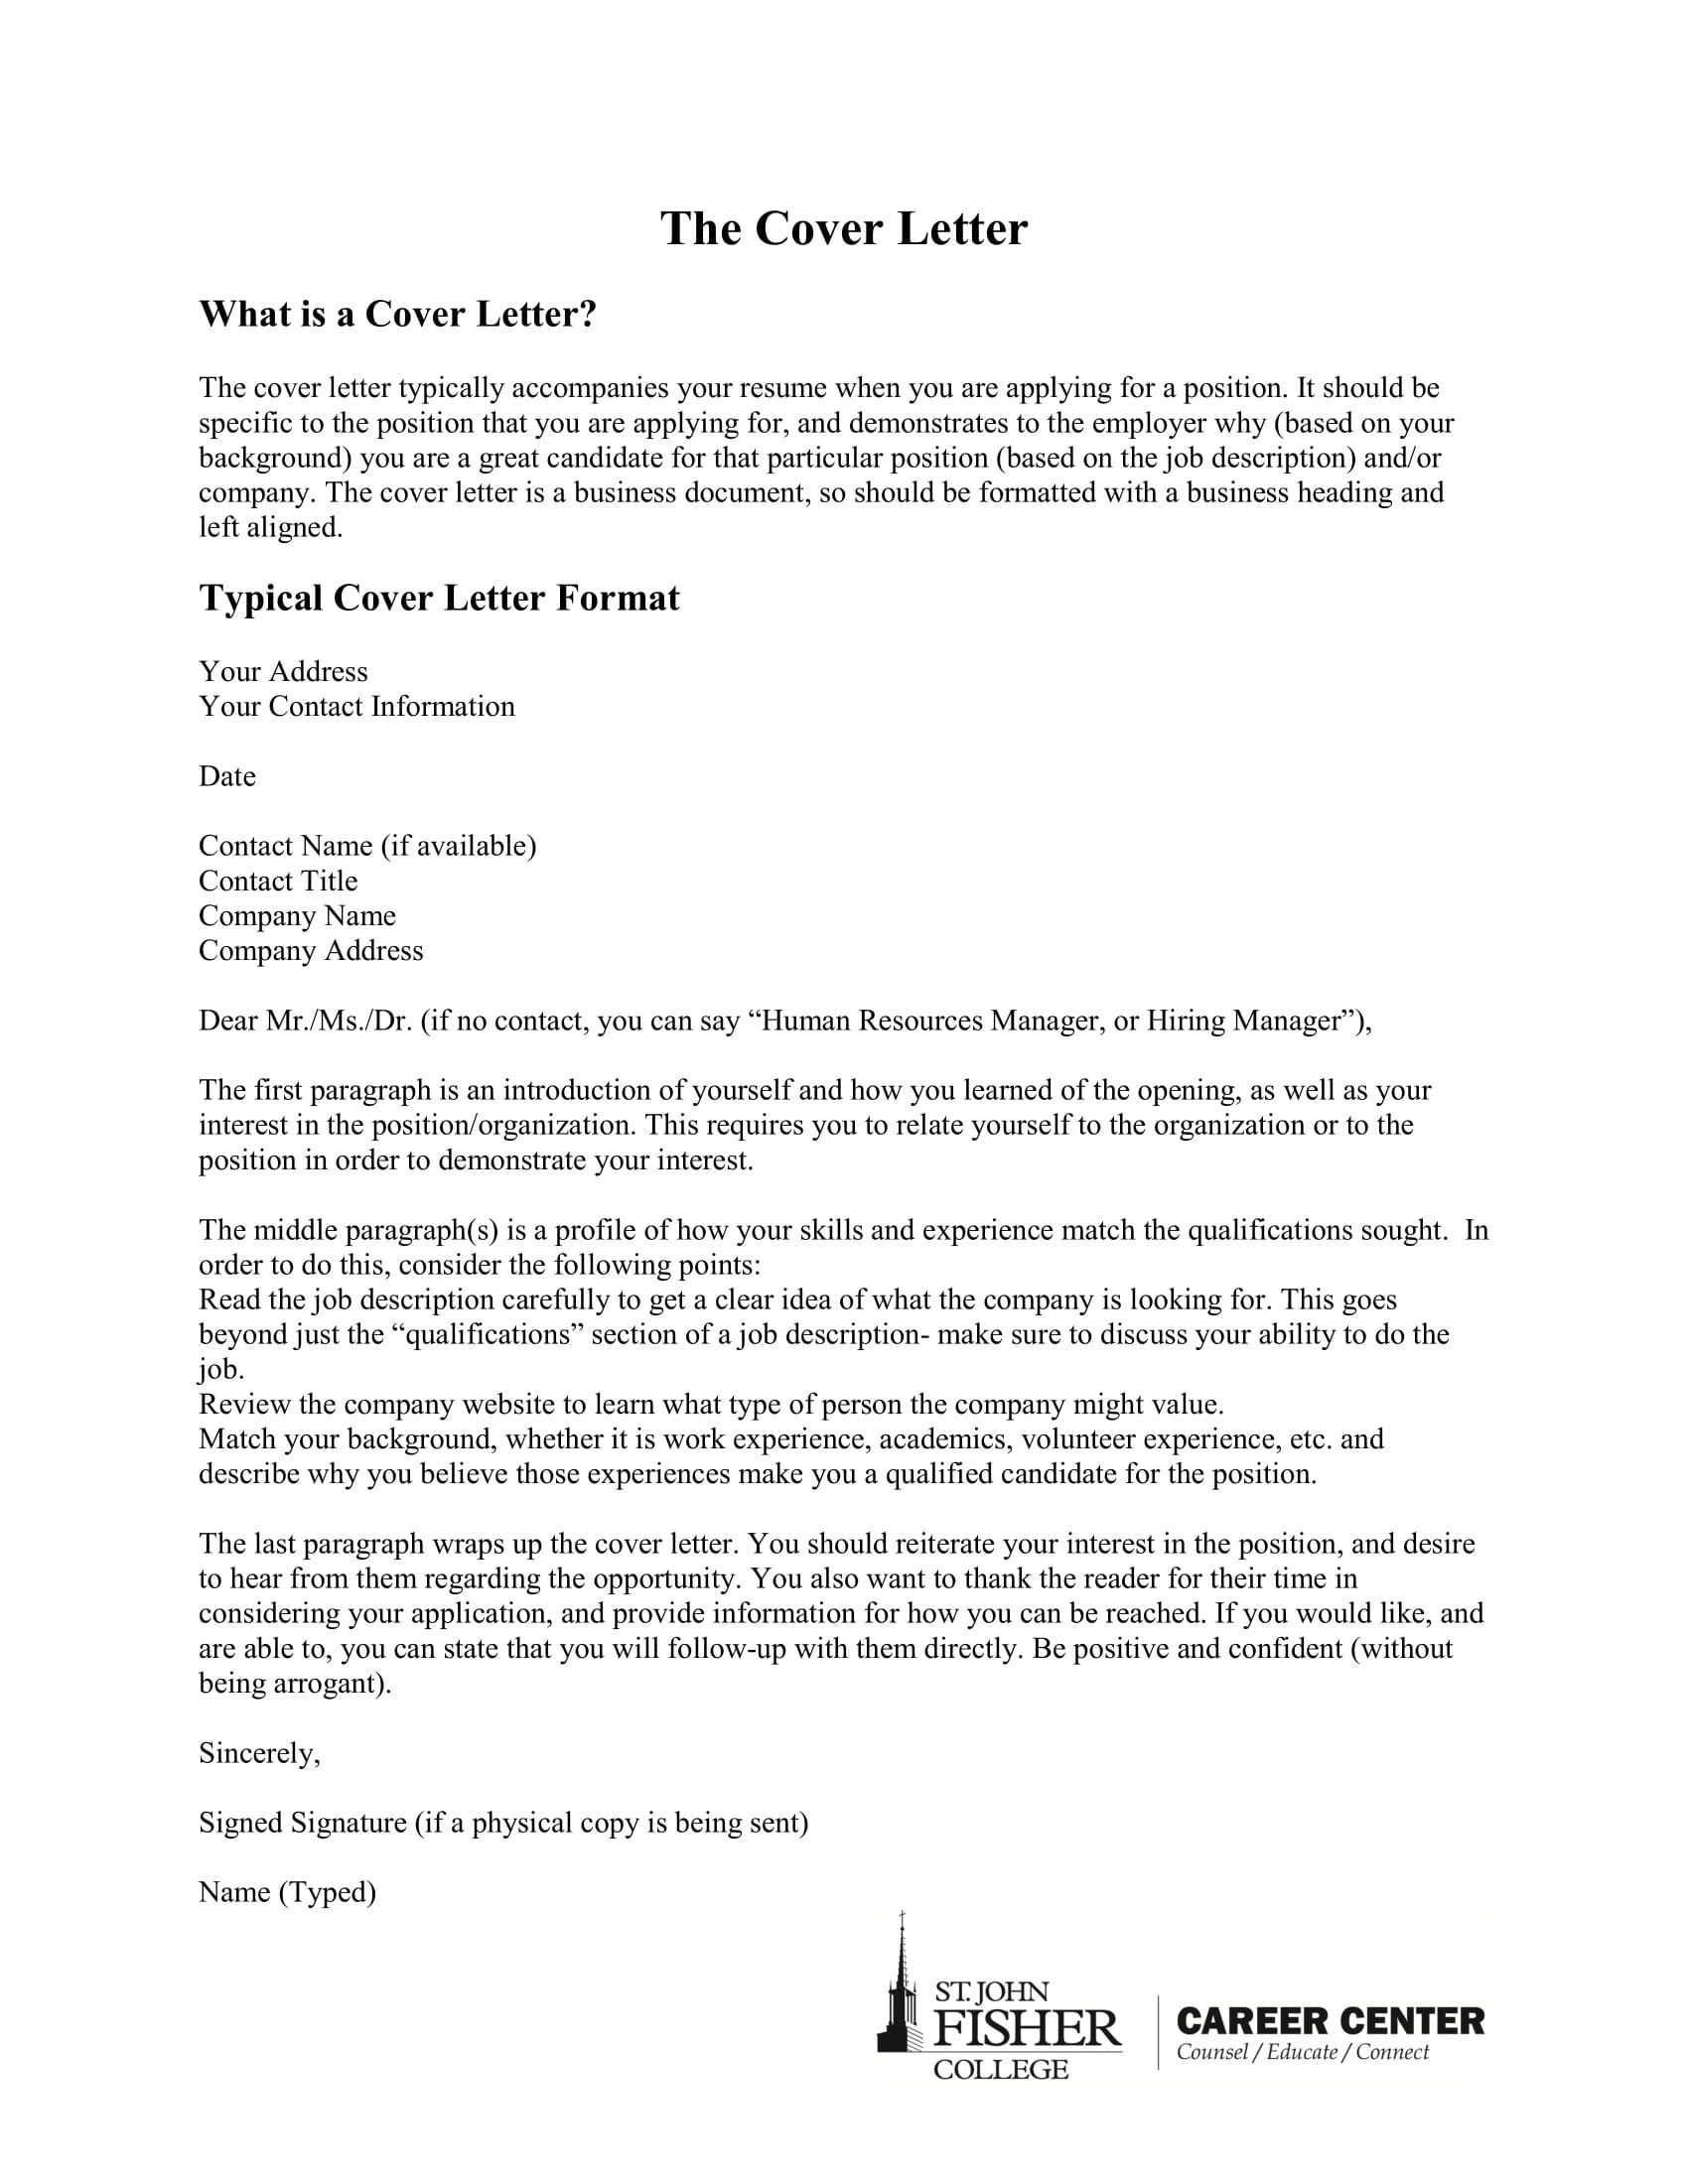 Compliance Letter Sample Pdf